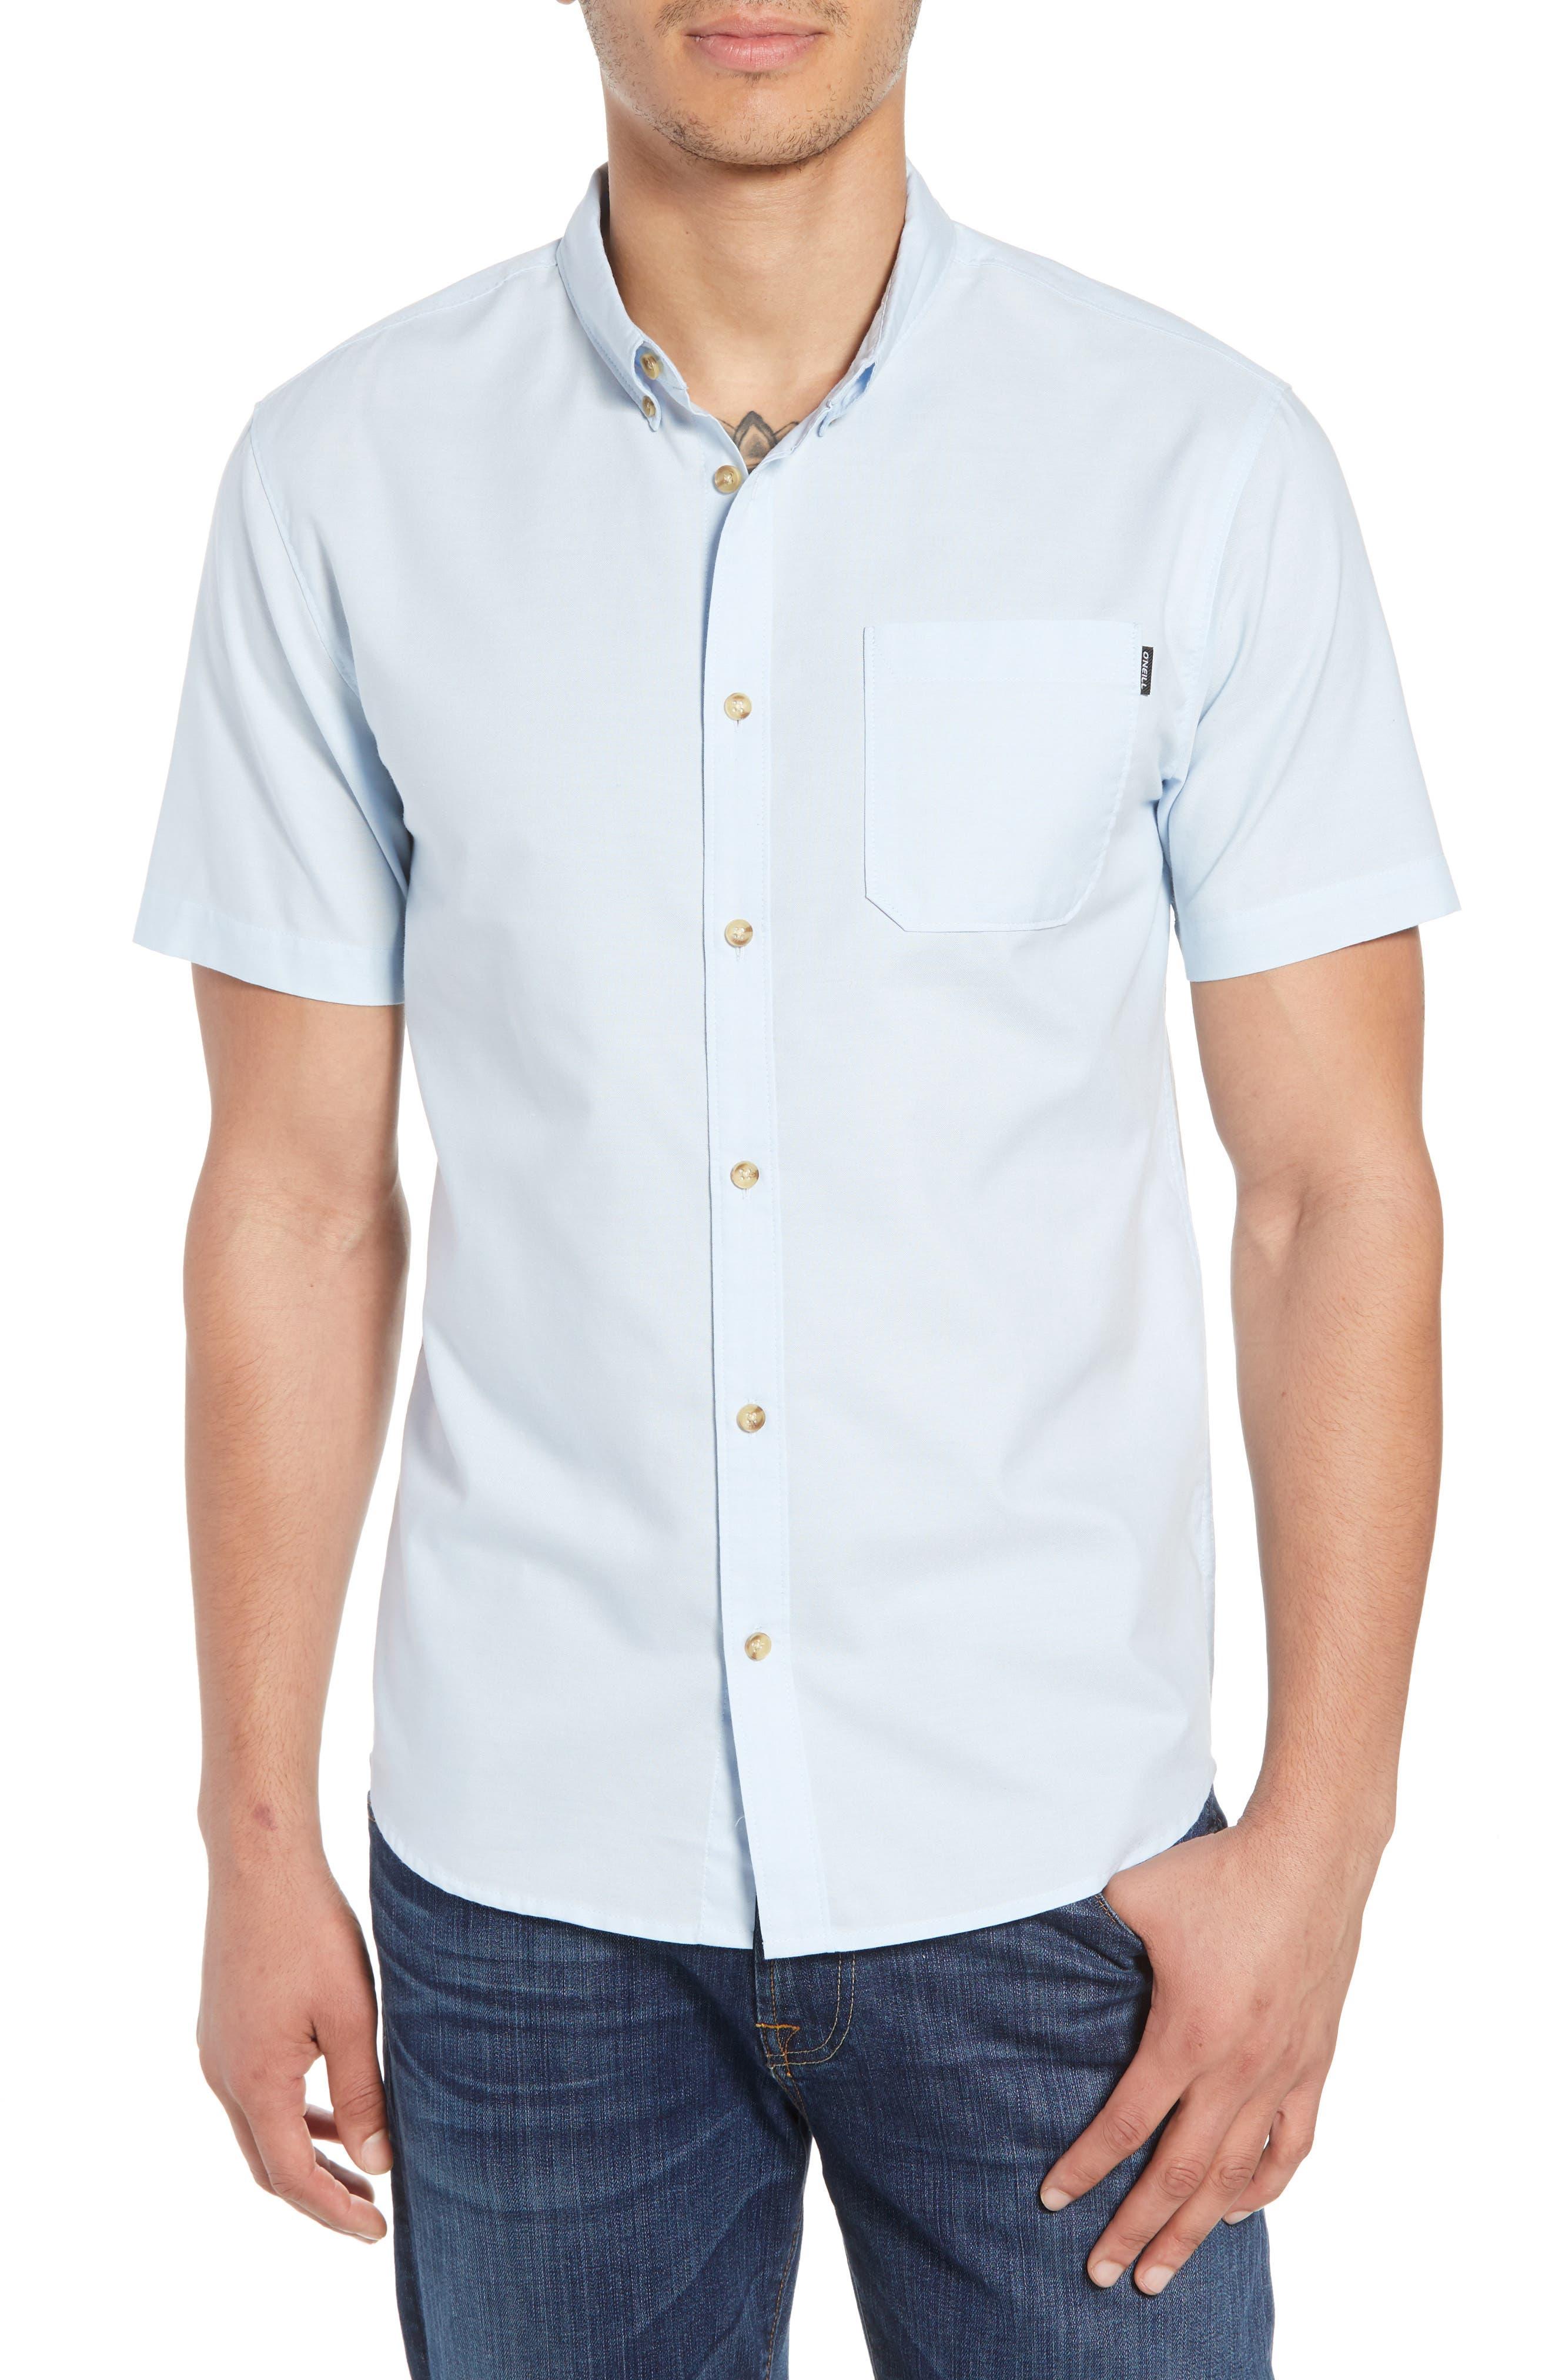 Banks Woven Shirt,                             Main thumbnail 1, color,                             Light Blue